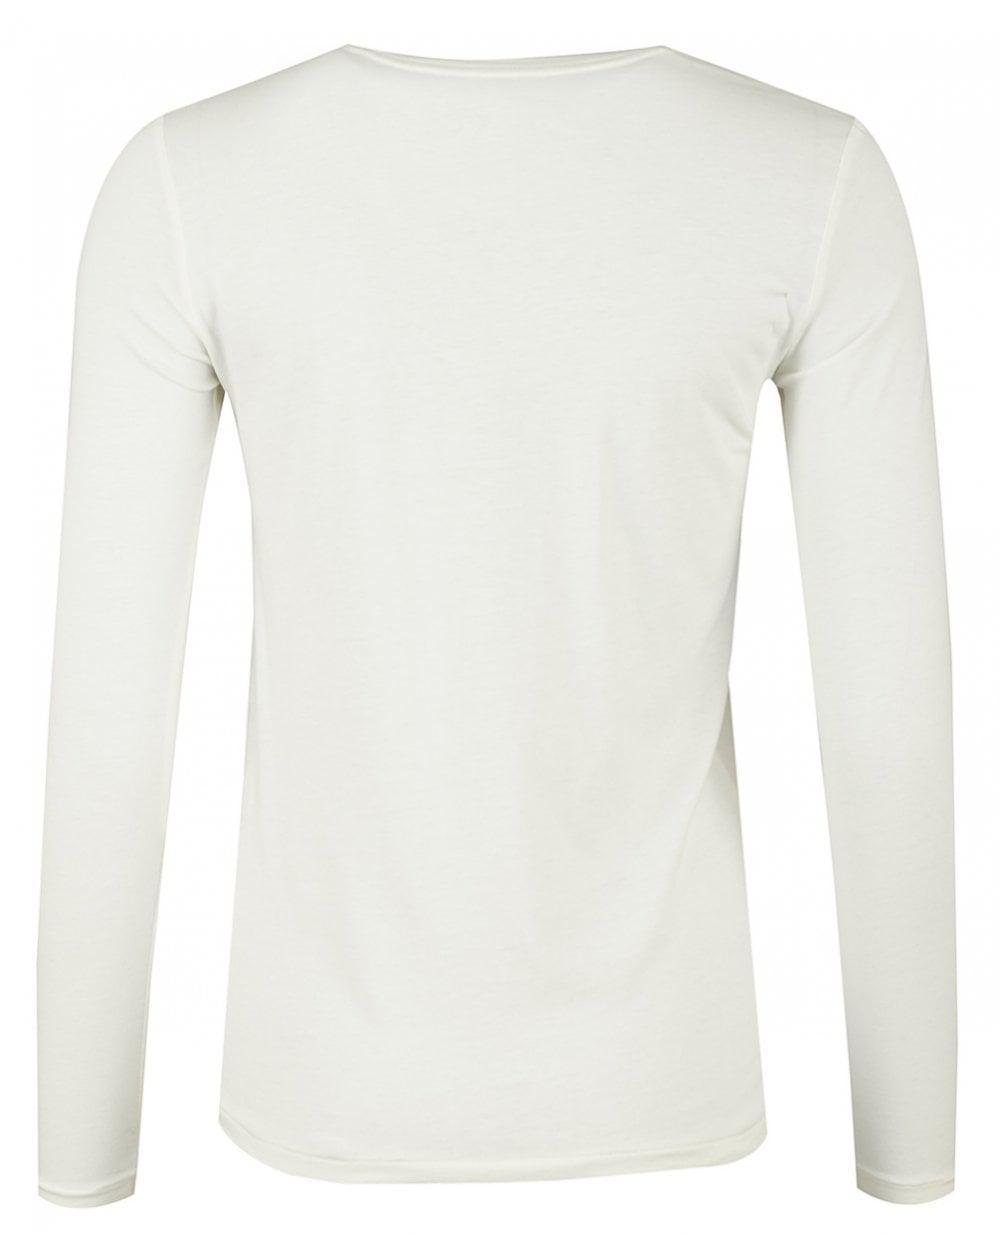 f1812ae2 authentic lyst polo ralph lauren long sleeved logo in white for men 9670c  8e57f